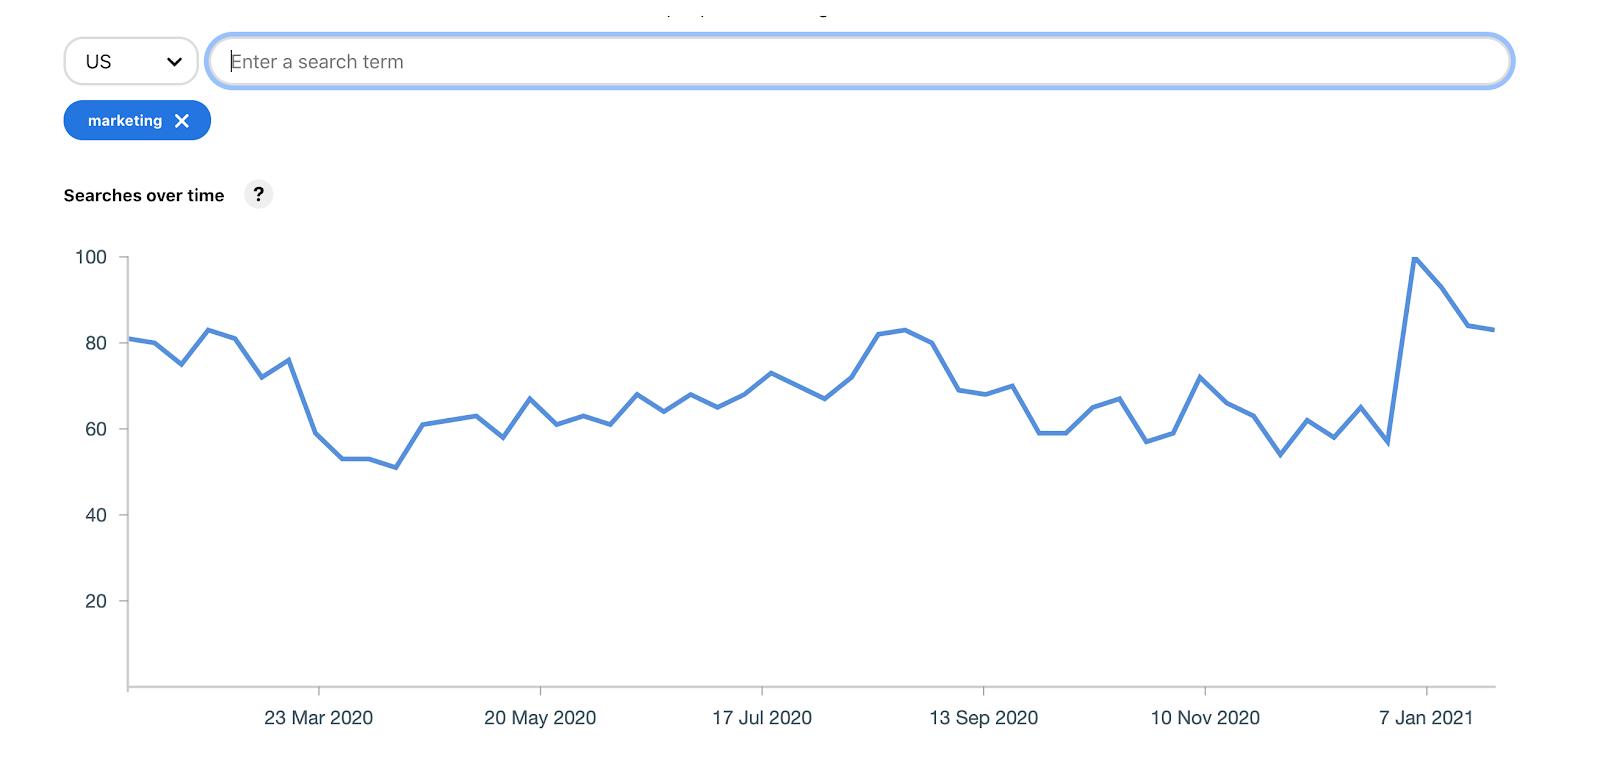 Pinterest marketing trends using Pinterest Trends tool - graph